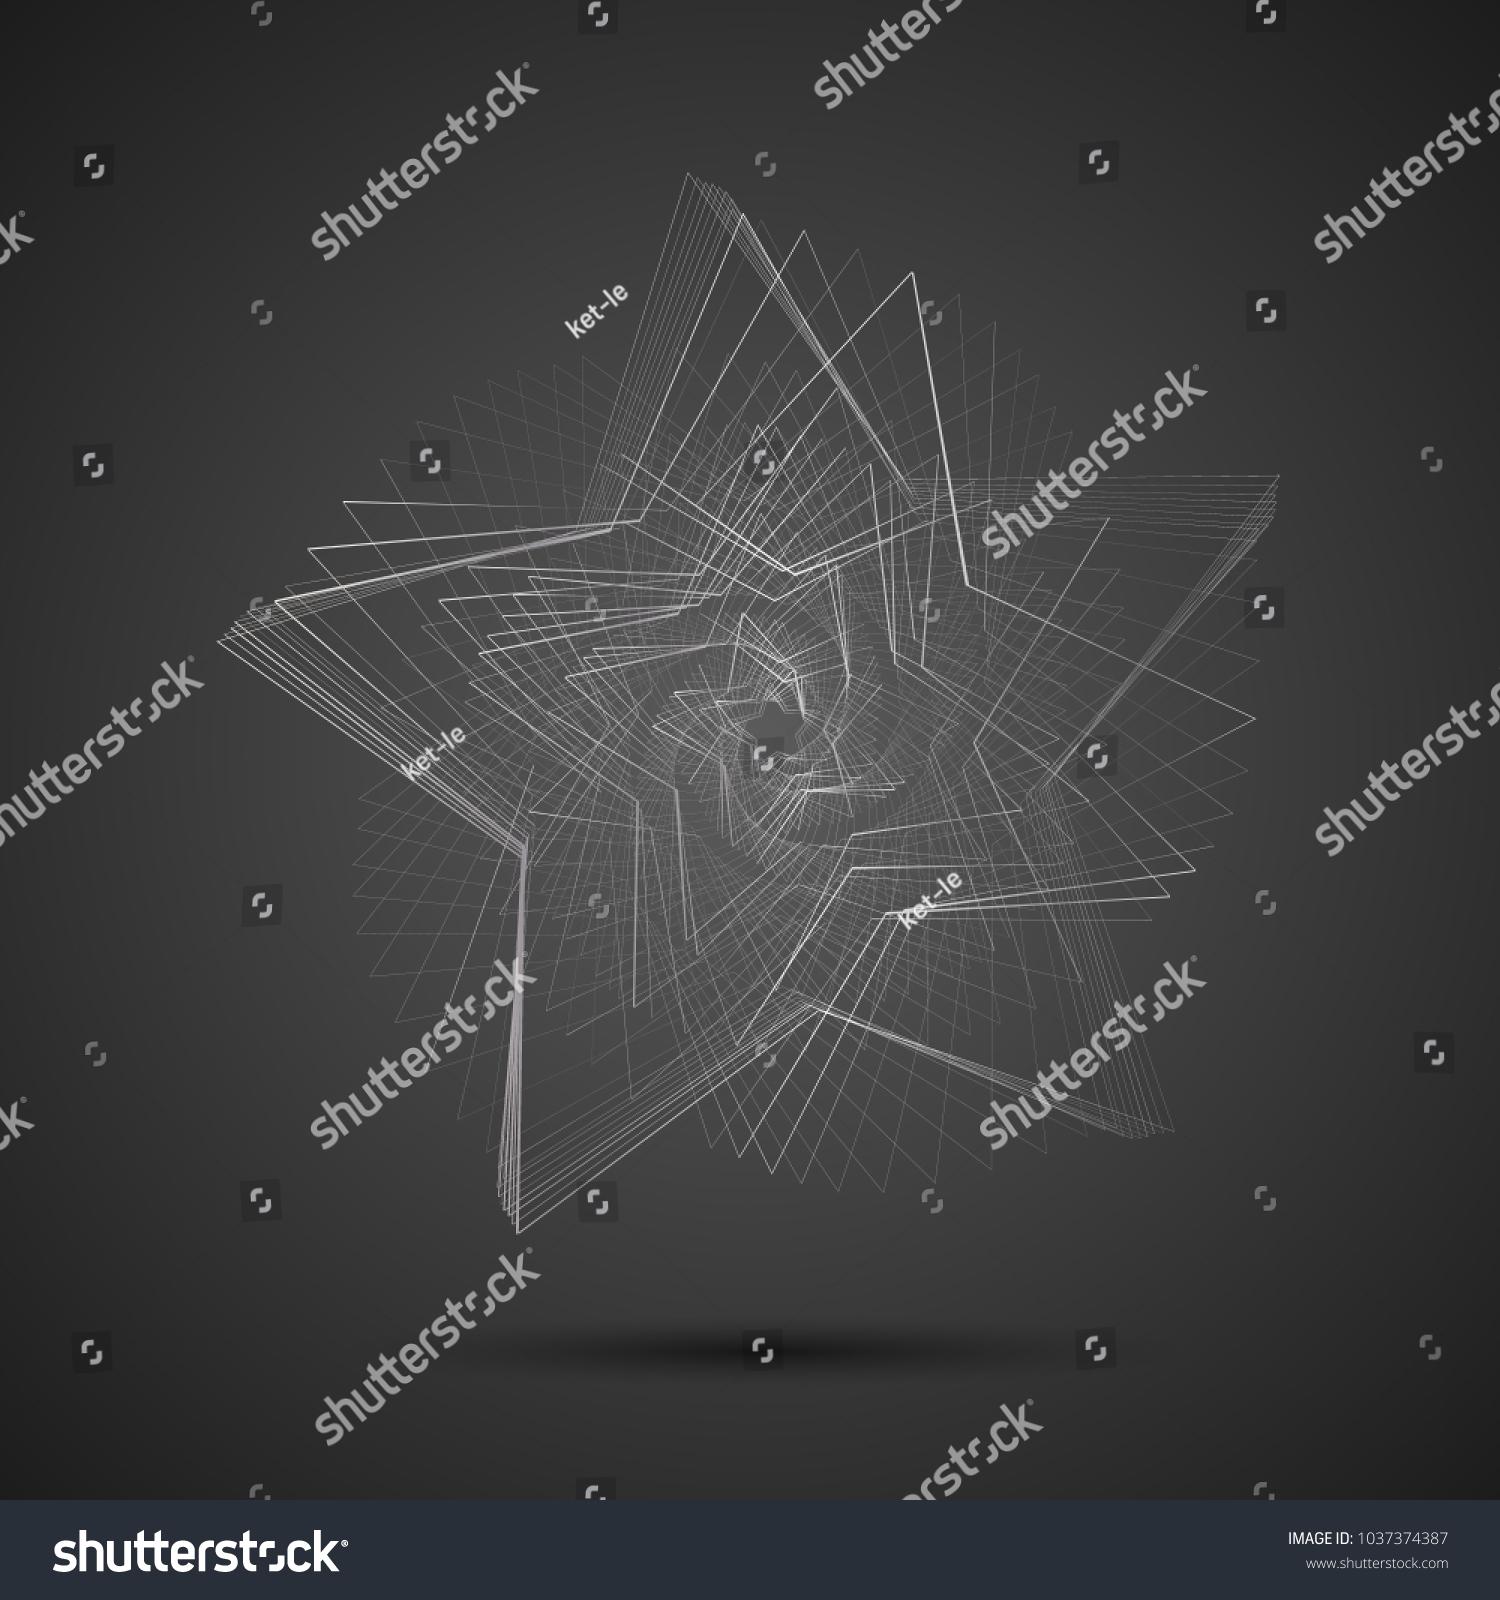 Creative Abstract Cyclic Spinning Spiral Star Stock Vector HD ...